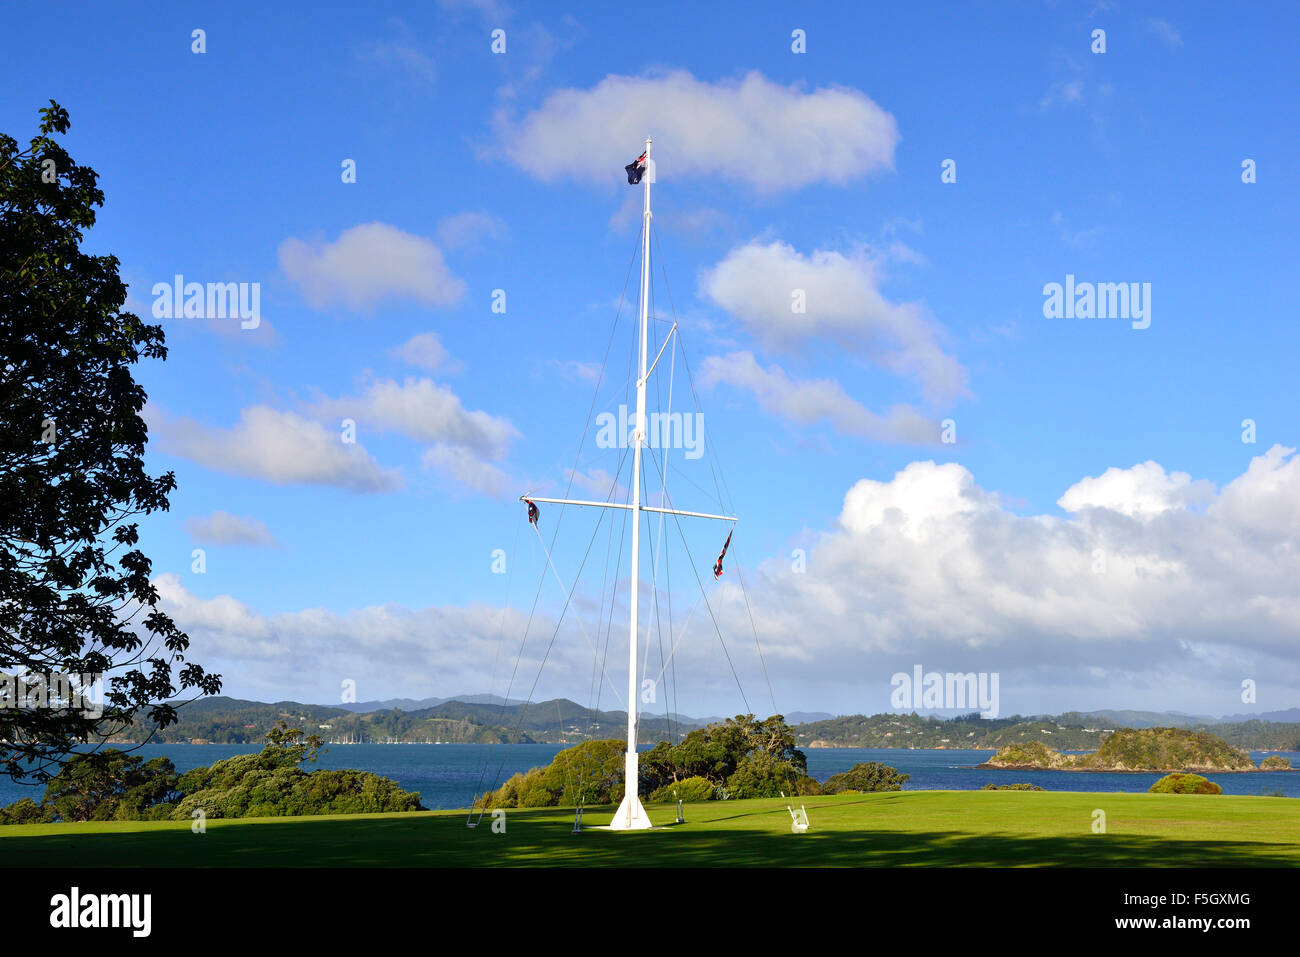 The flagstaff in Treaty of Waitangi  Grounds marks the spot where the Treaty of Waitangi was first signed on 6 February - Stock Image